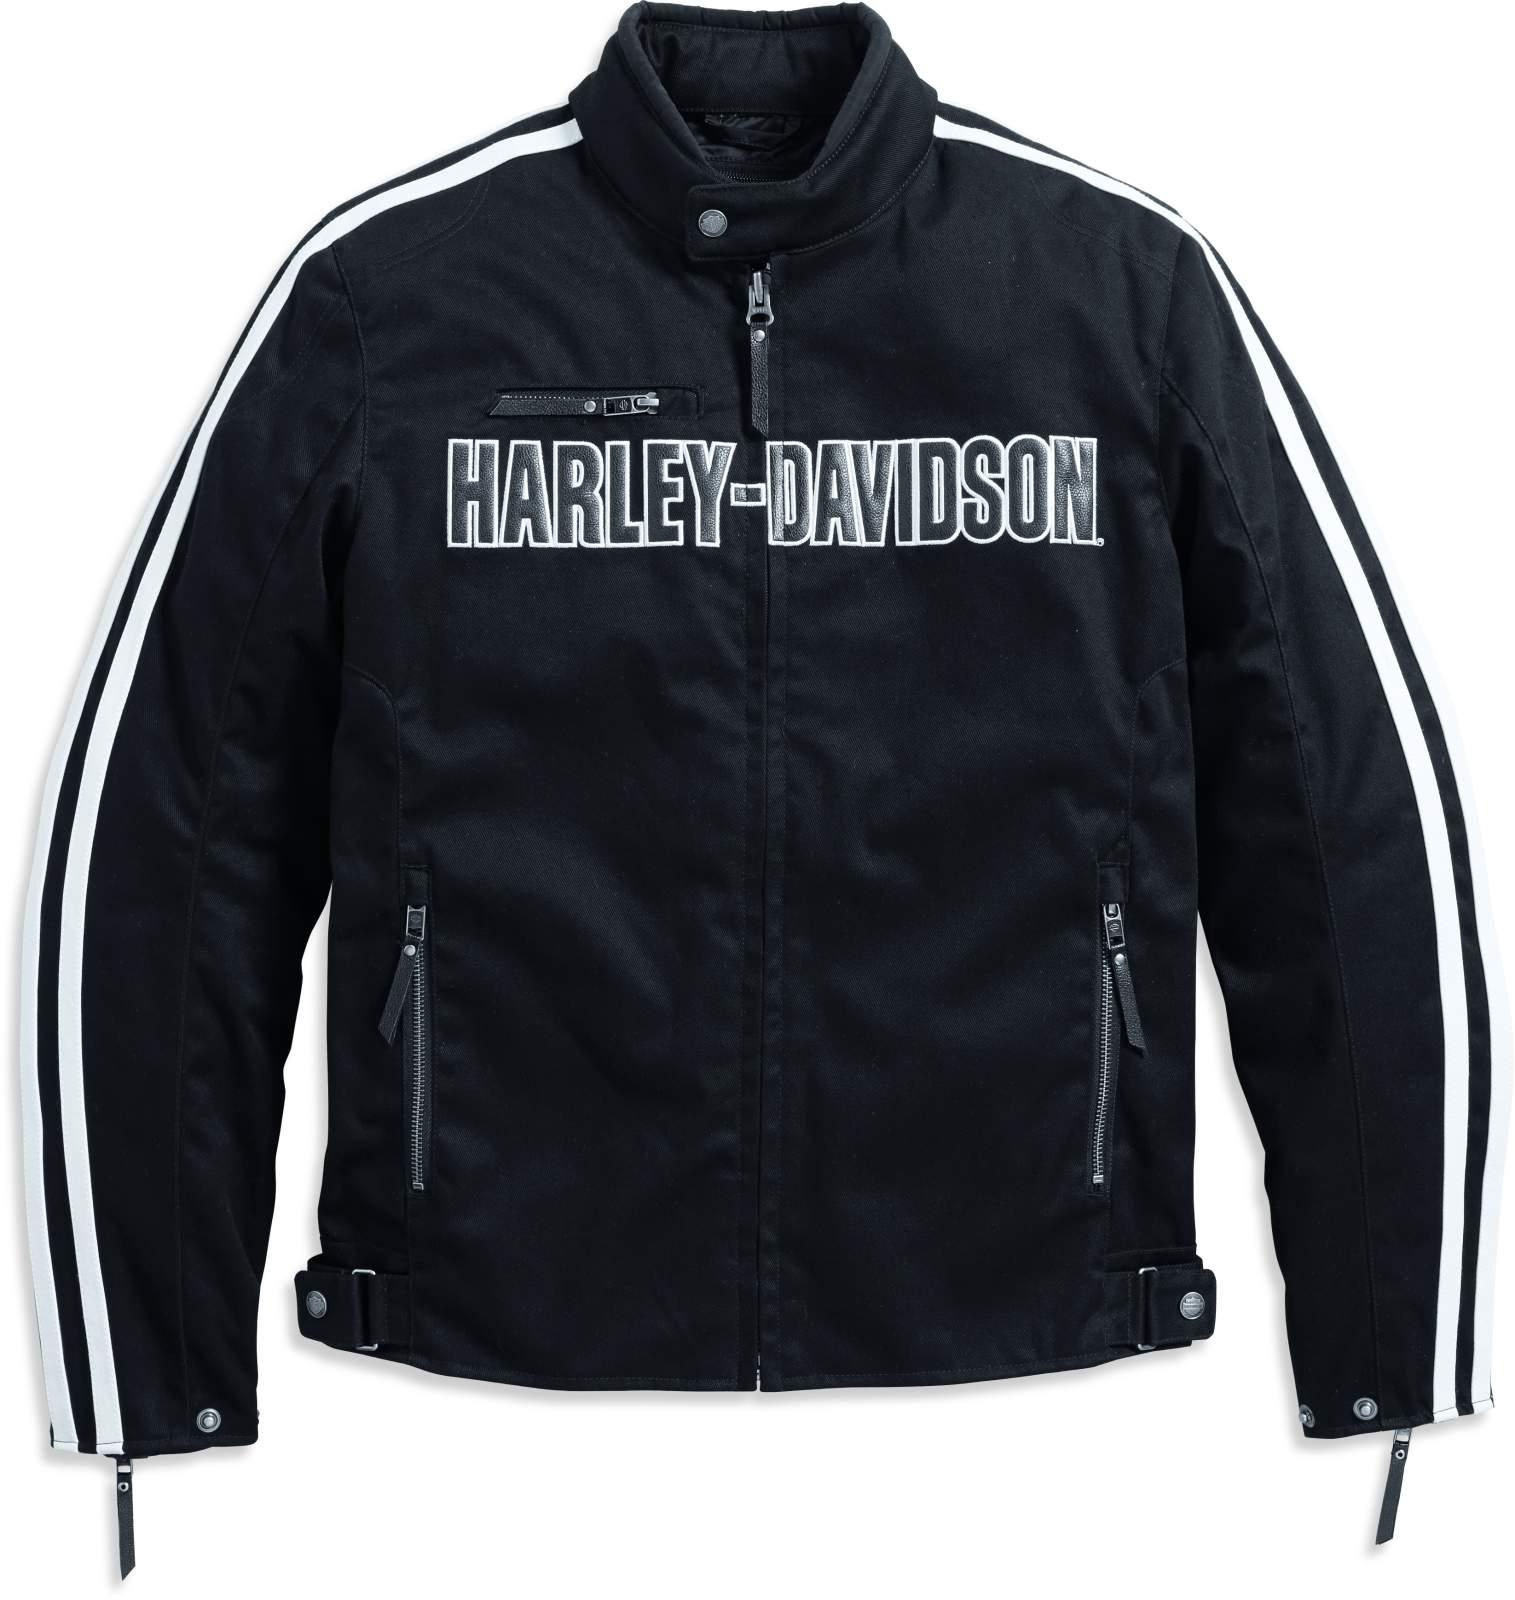 venta minorista 14b40 3cc32 Cazadora Harley-Davidson Textil Jacket Rally Riding EC